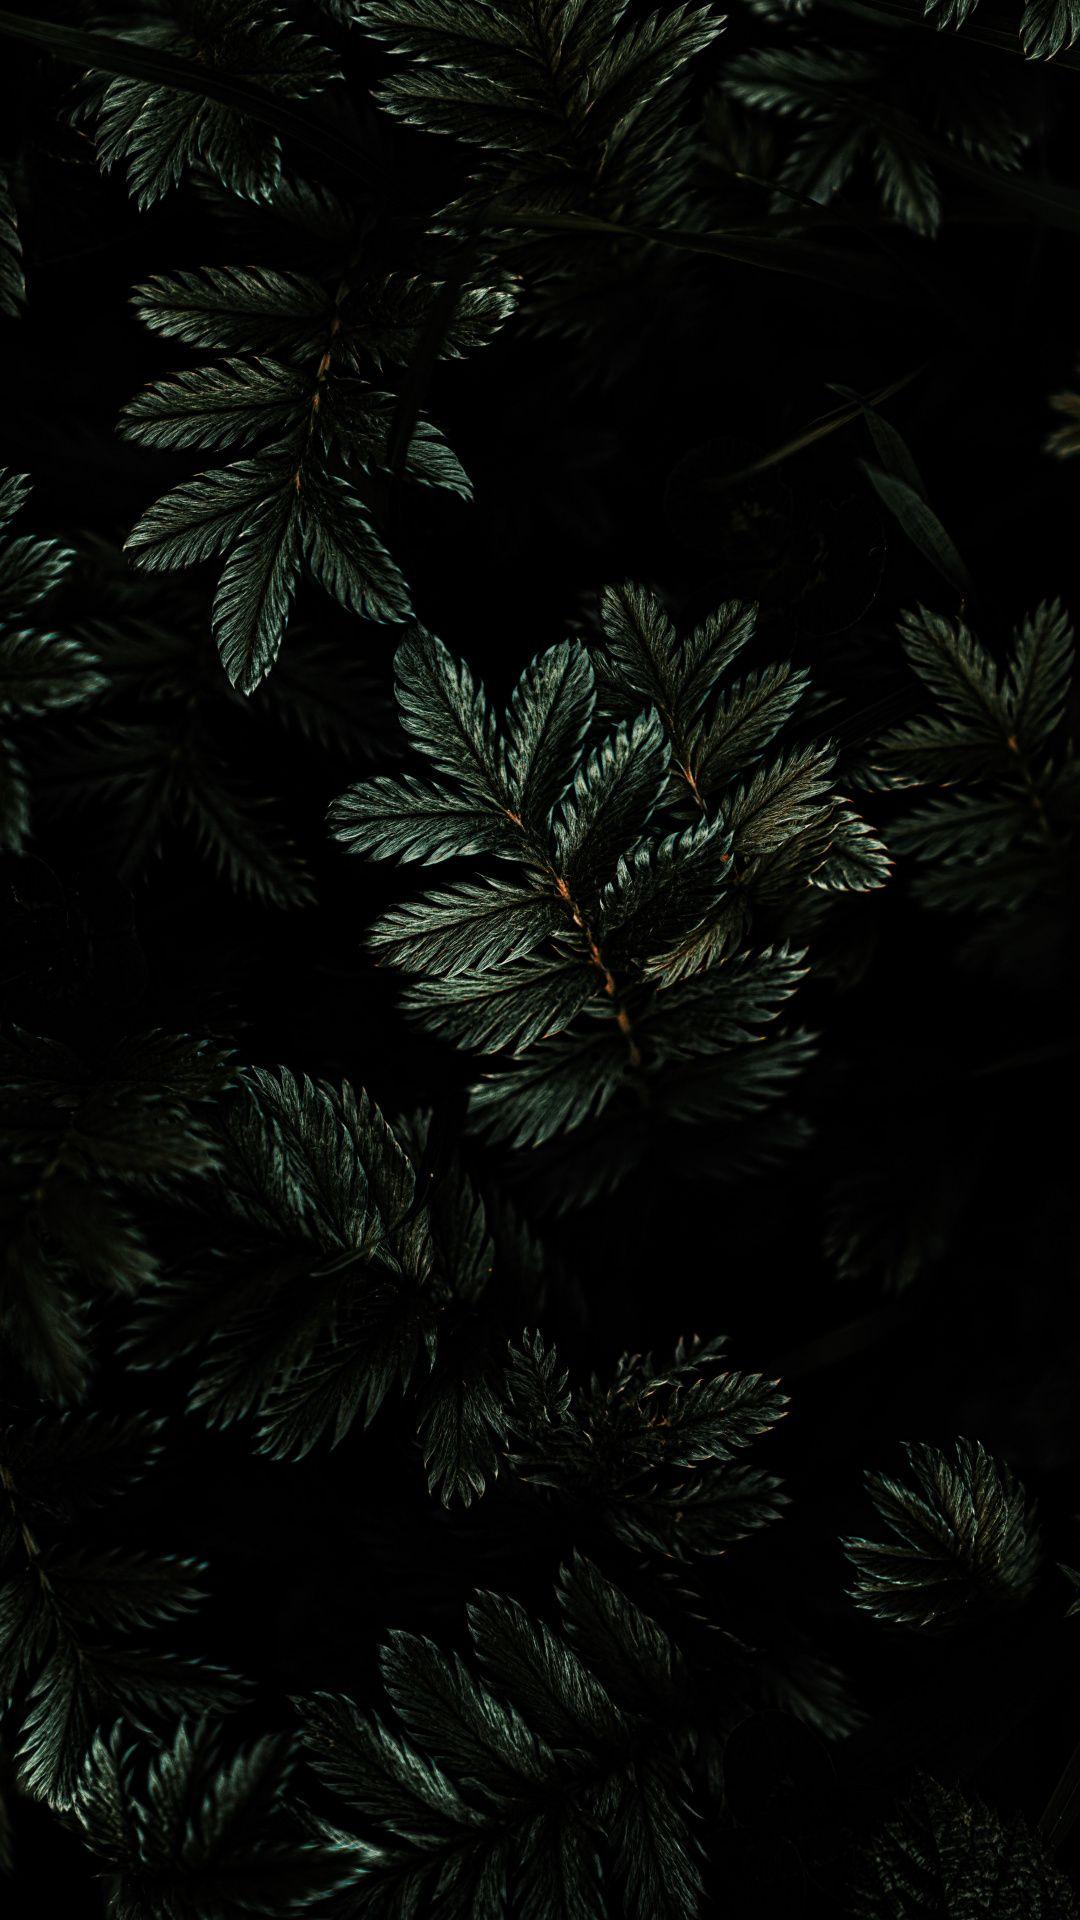 1080x1920 Leaves Branches Dark Wallpaper Dark Wallpaper Ipad Wallpaper Hd Ipad Wallpapers